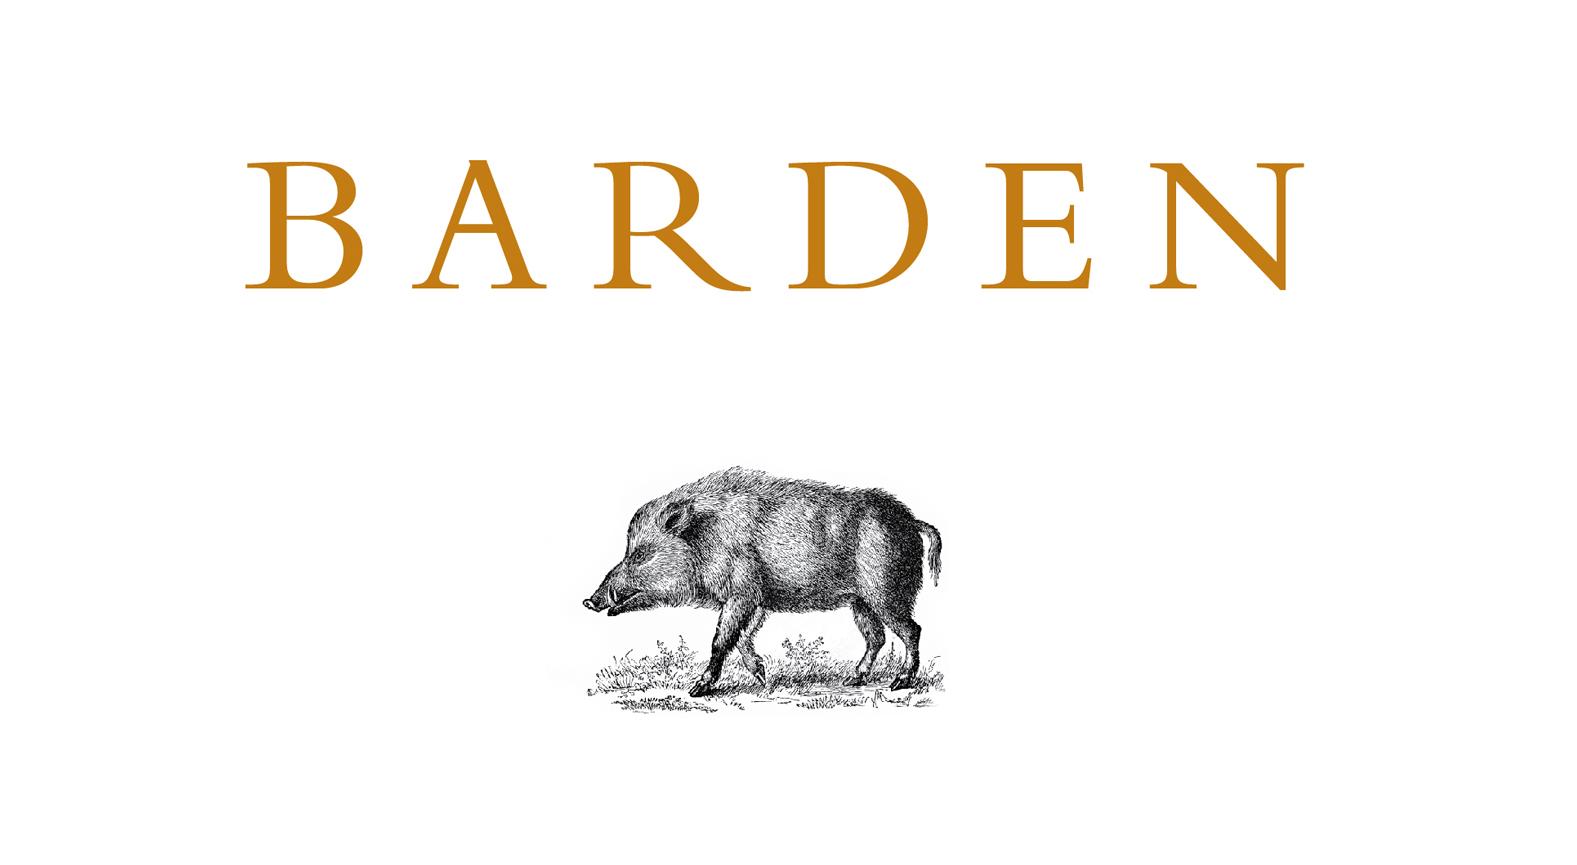 barden-logo.jpg